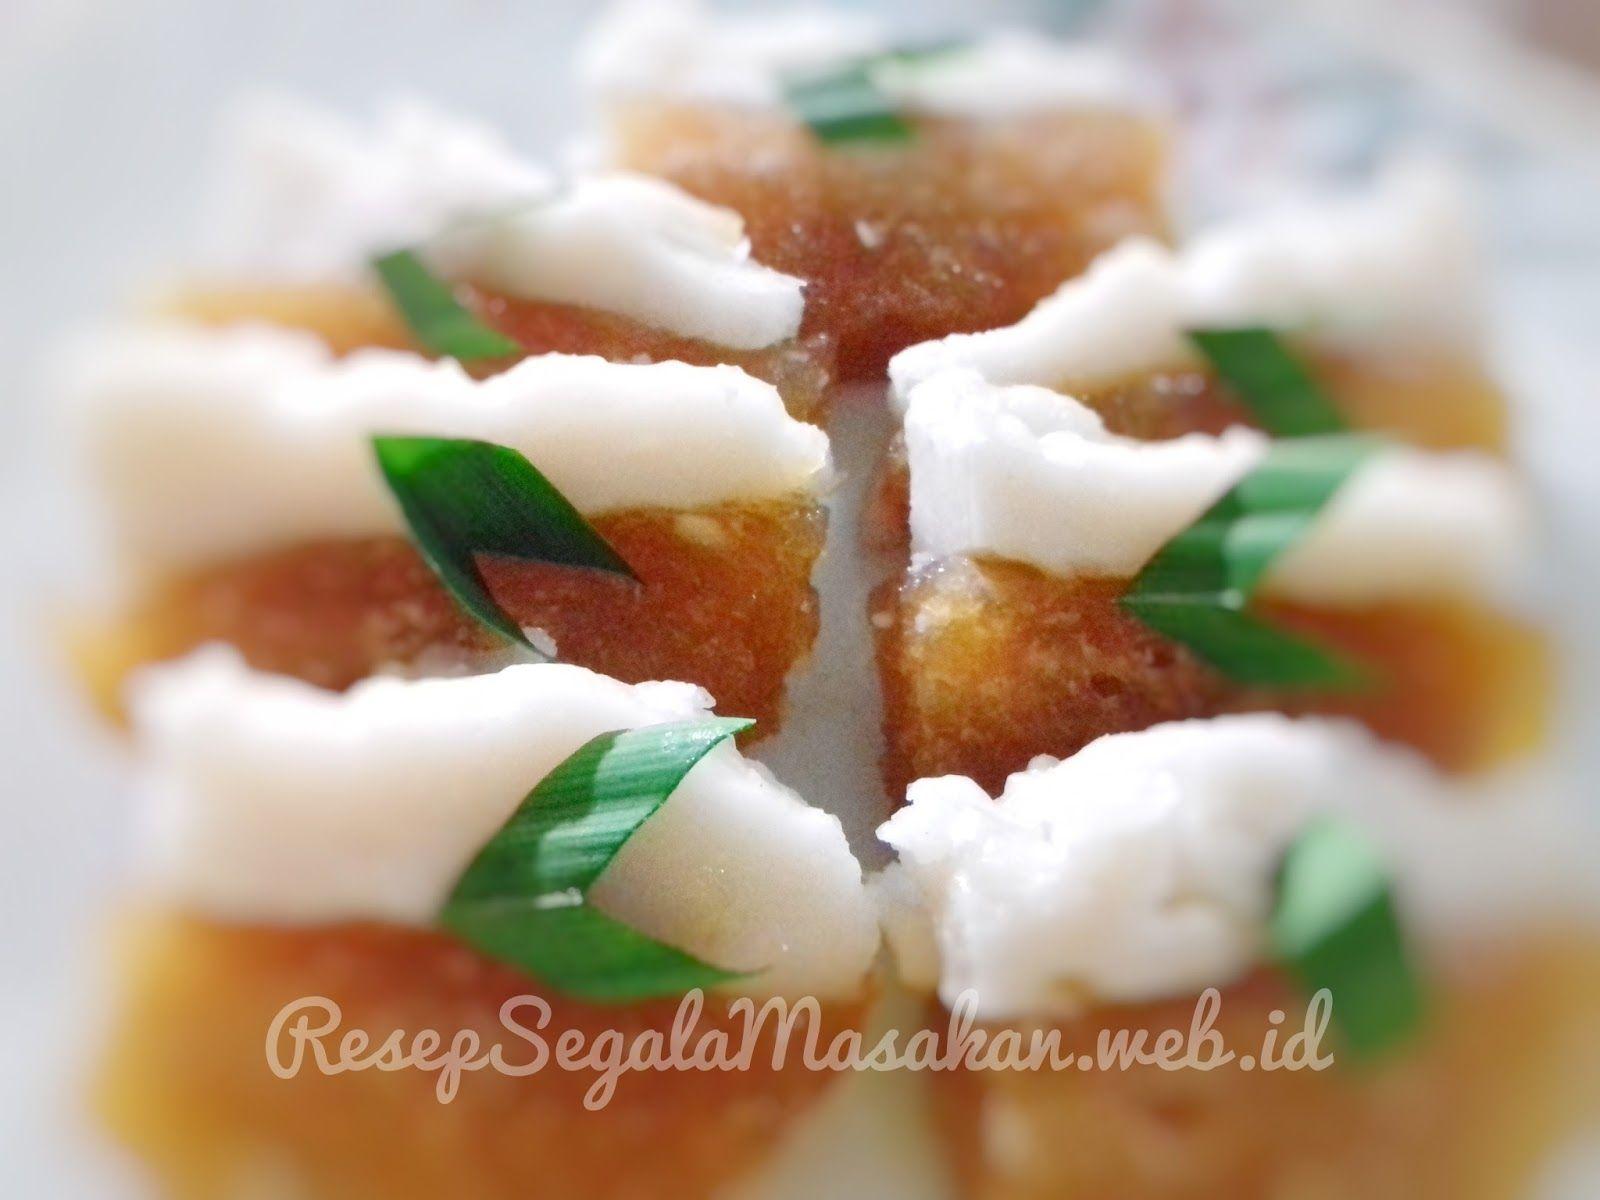 Resep Membuat Kue Talam Singkong Resep Segala Masakan Web Id Ide Makanan Makanan Resep